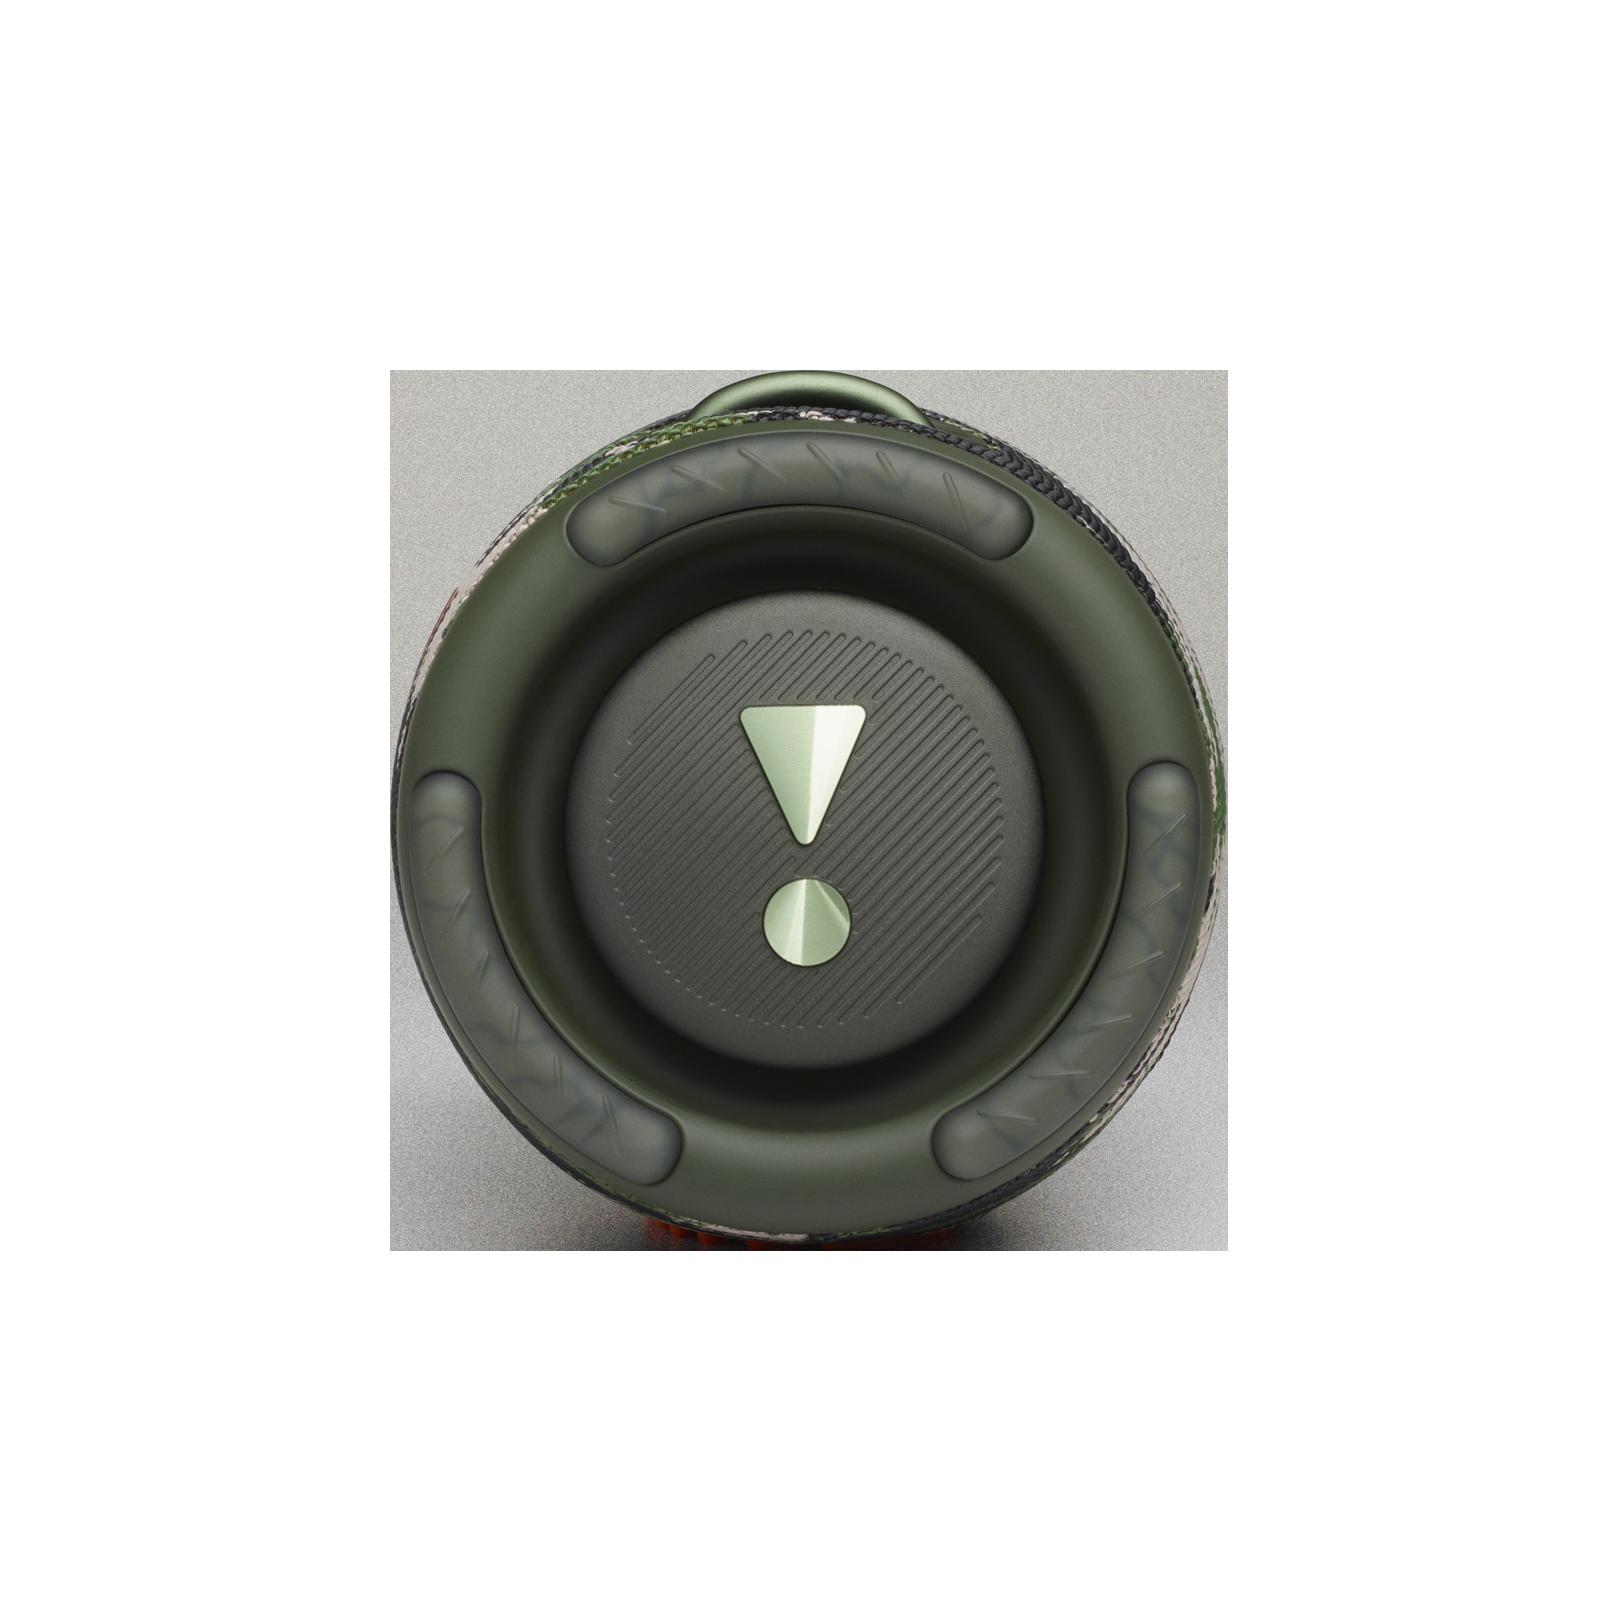 JBL Xtreme 3 - Black Camo - Portable waterproof speaker - Left